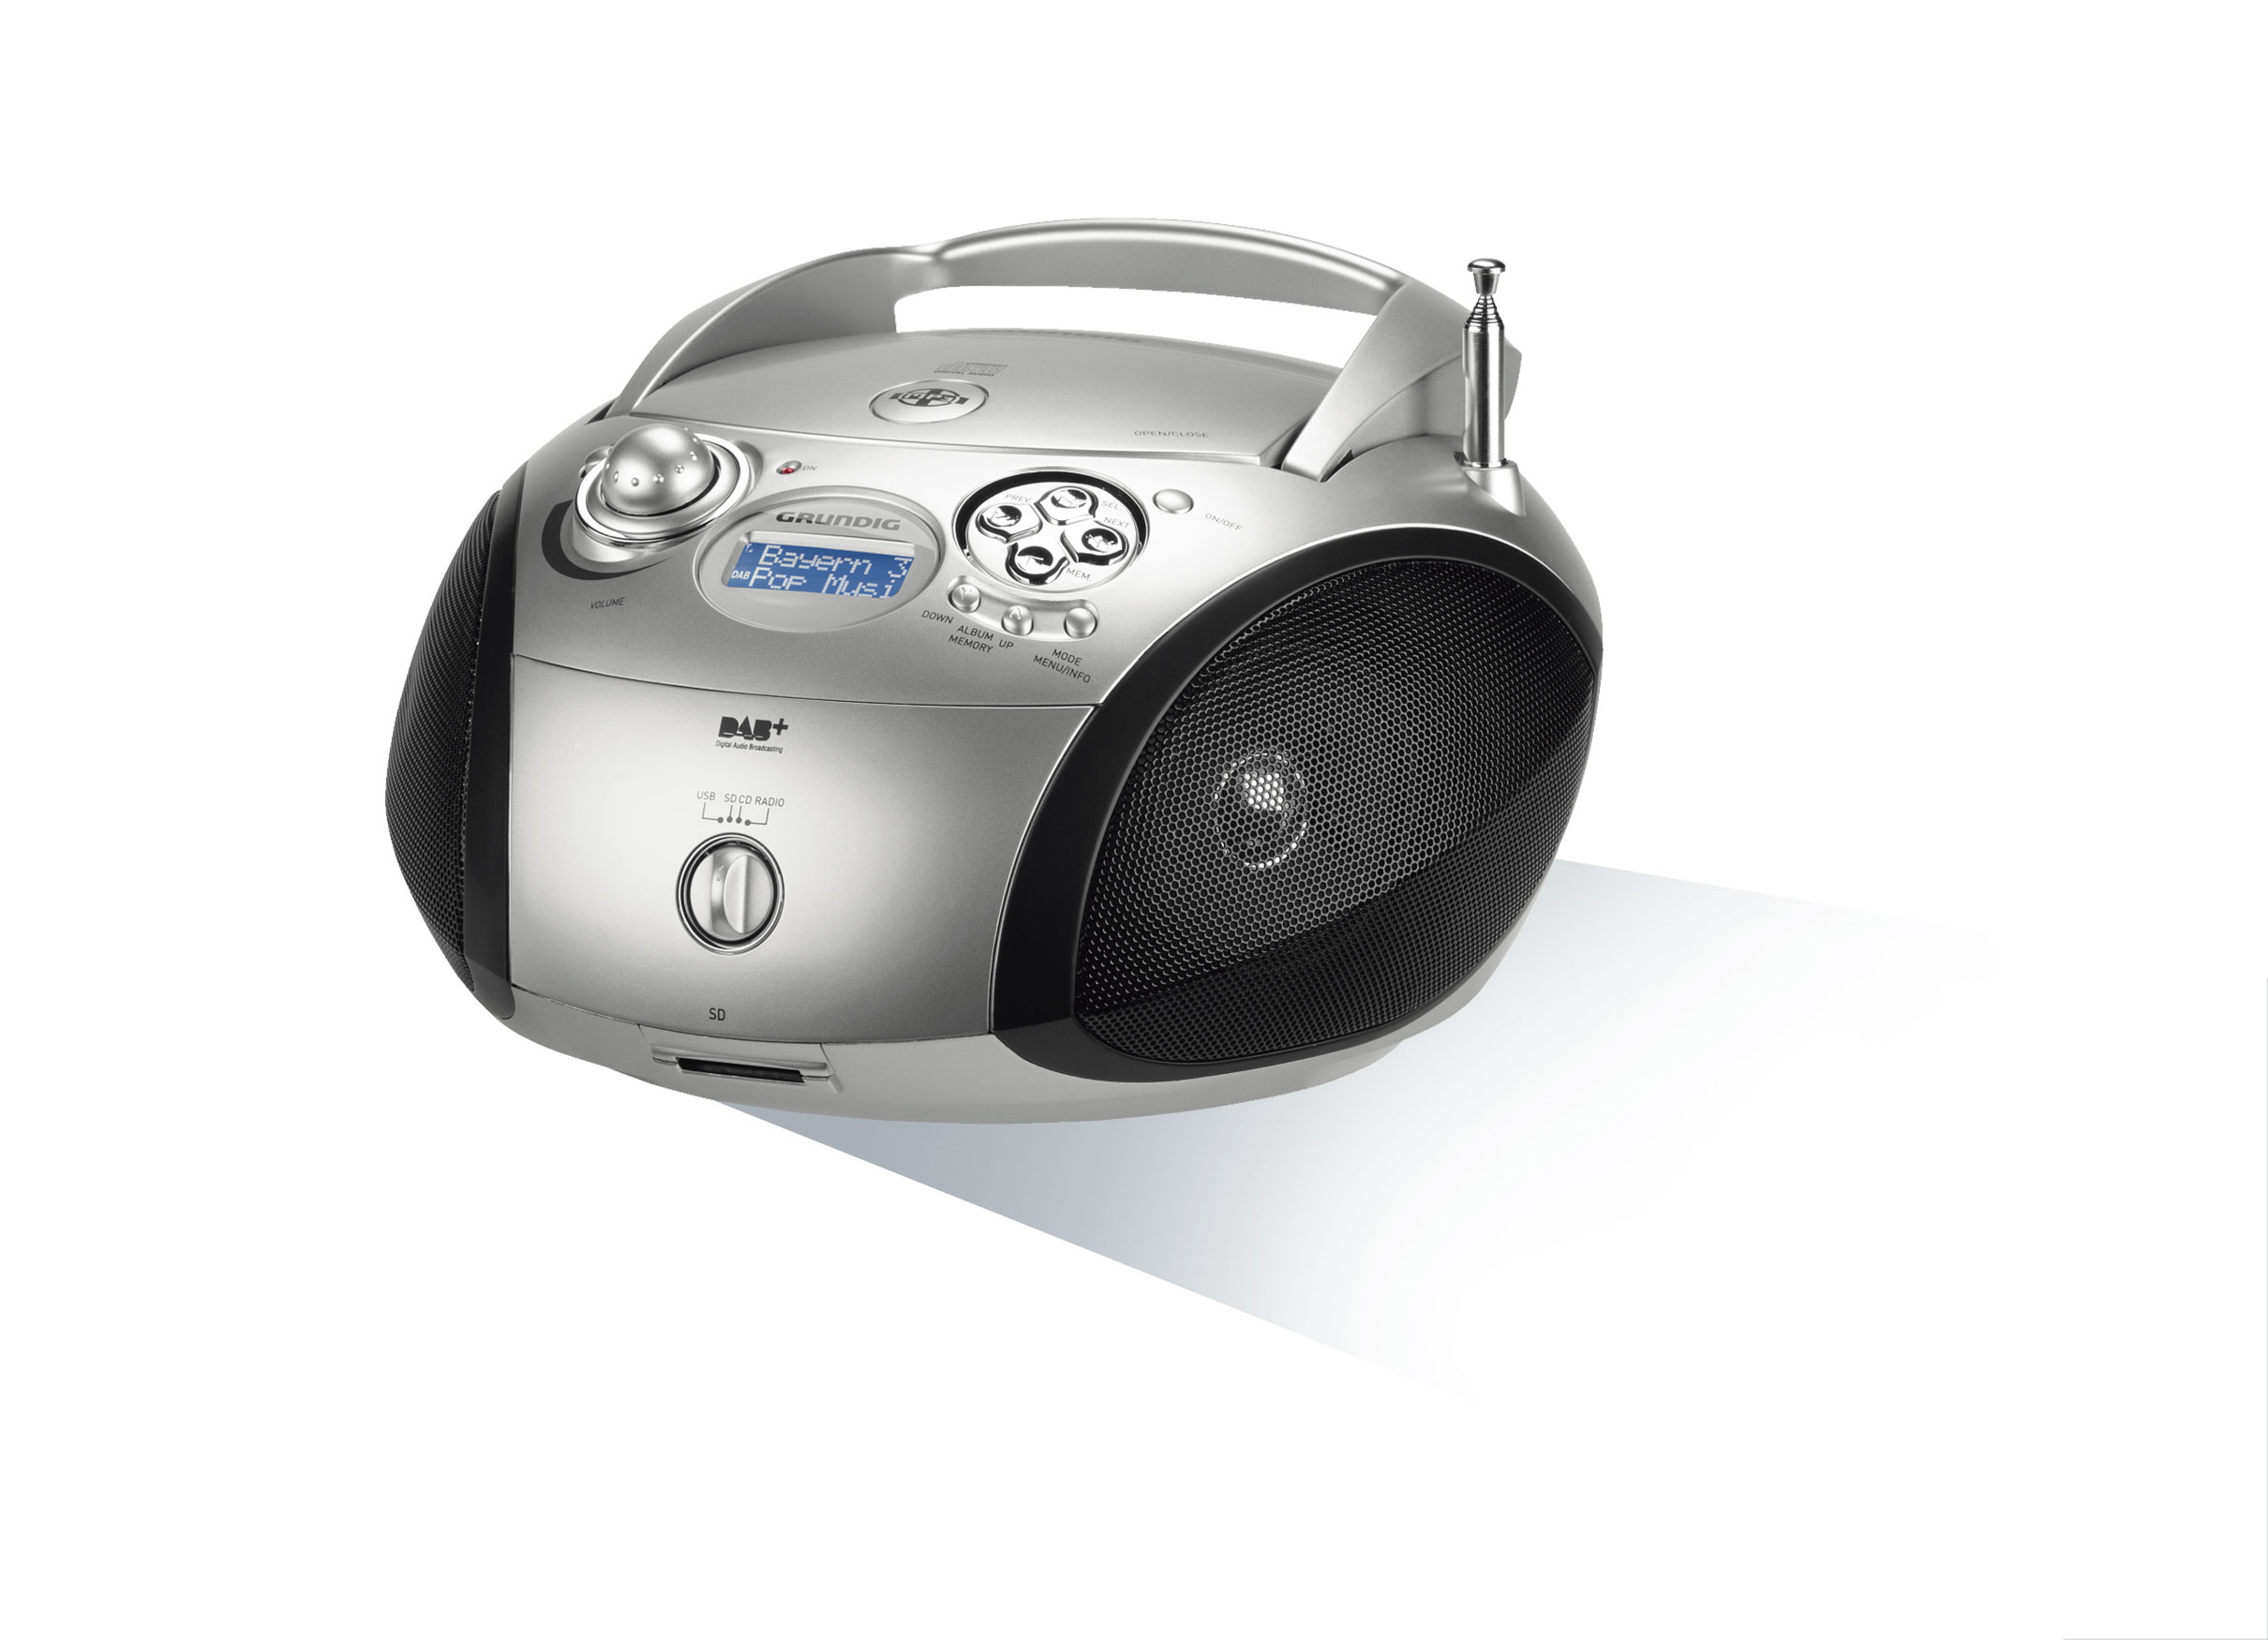 Grundig RCD 1460 Boombox DAB+ UKW CD MP3-CD für 109,99 Euro